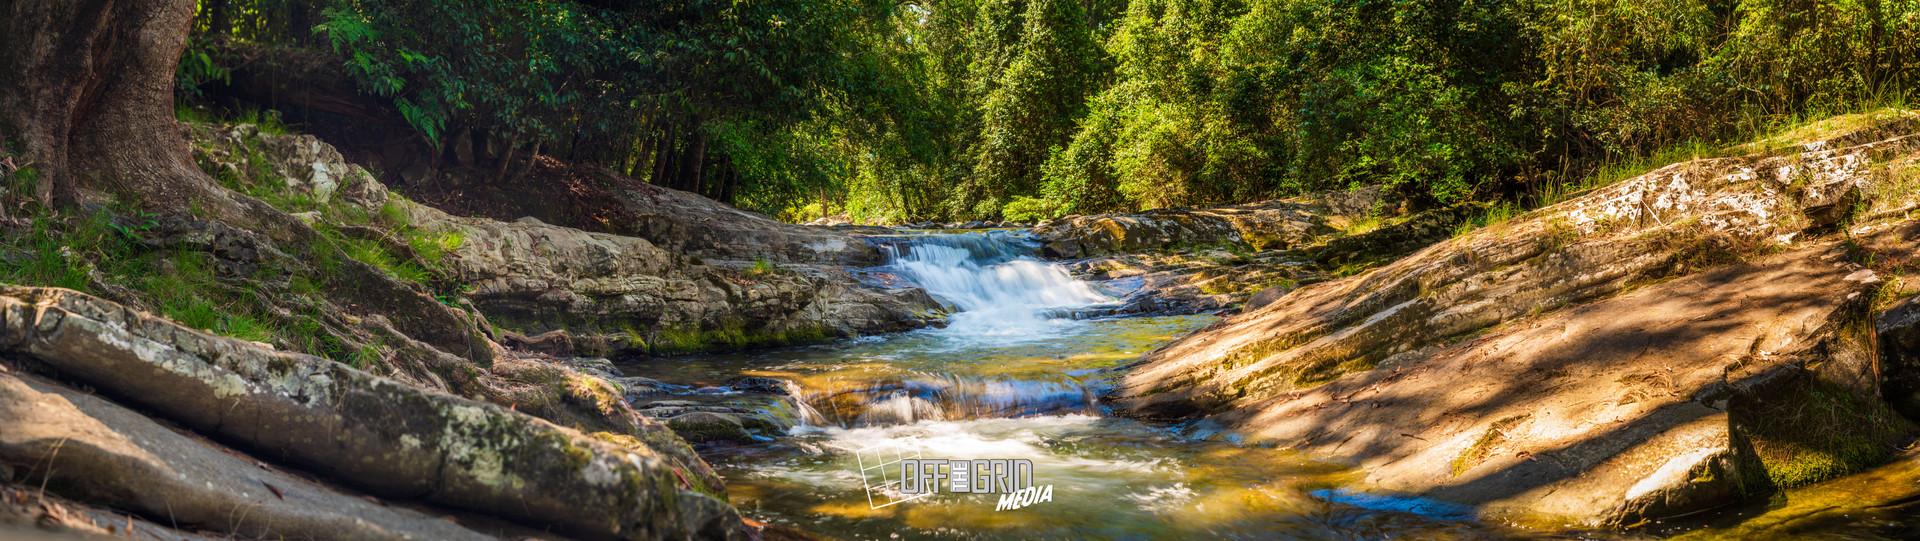 Allyn River - Ladies Well